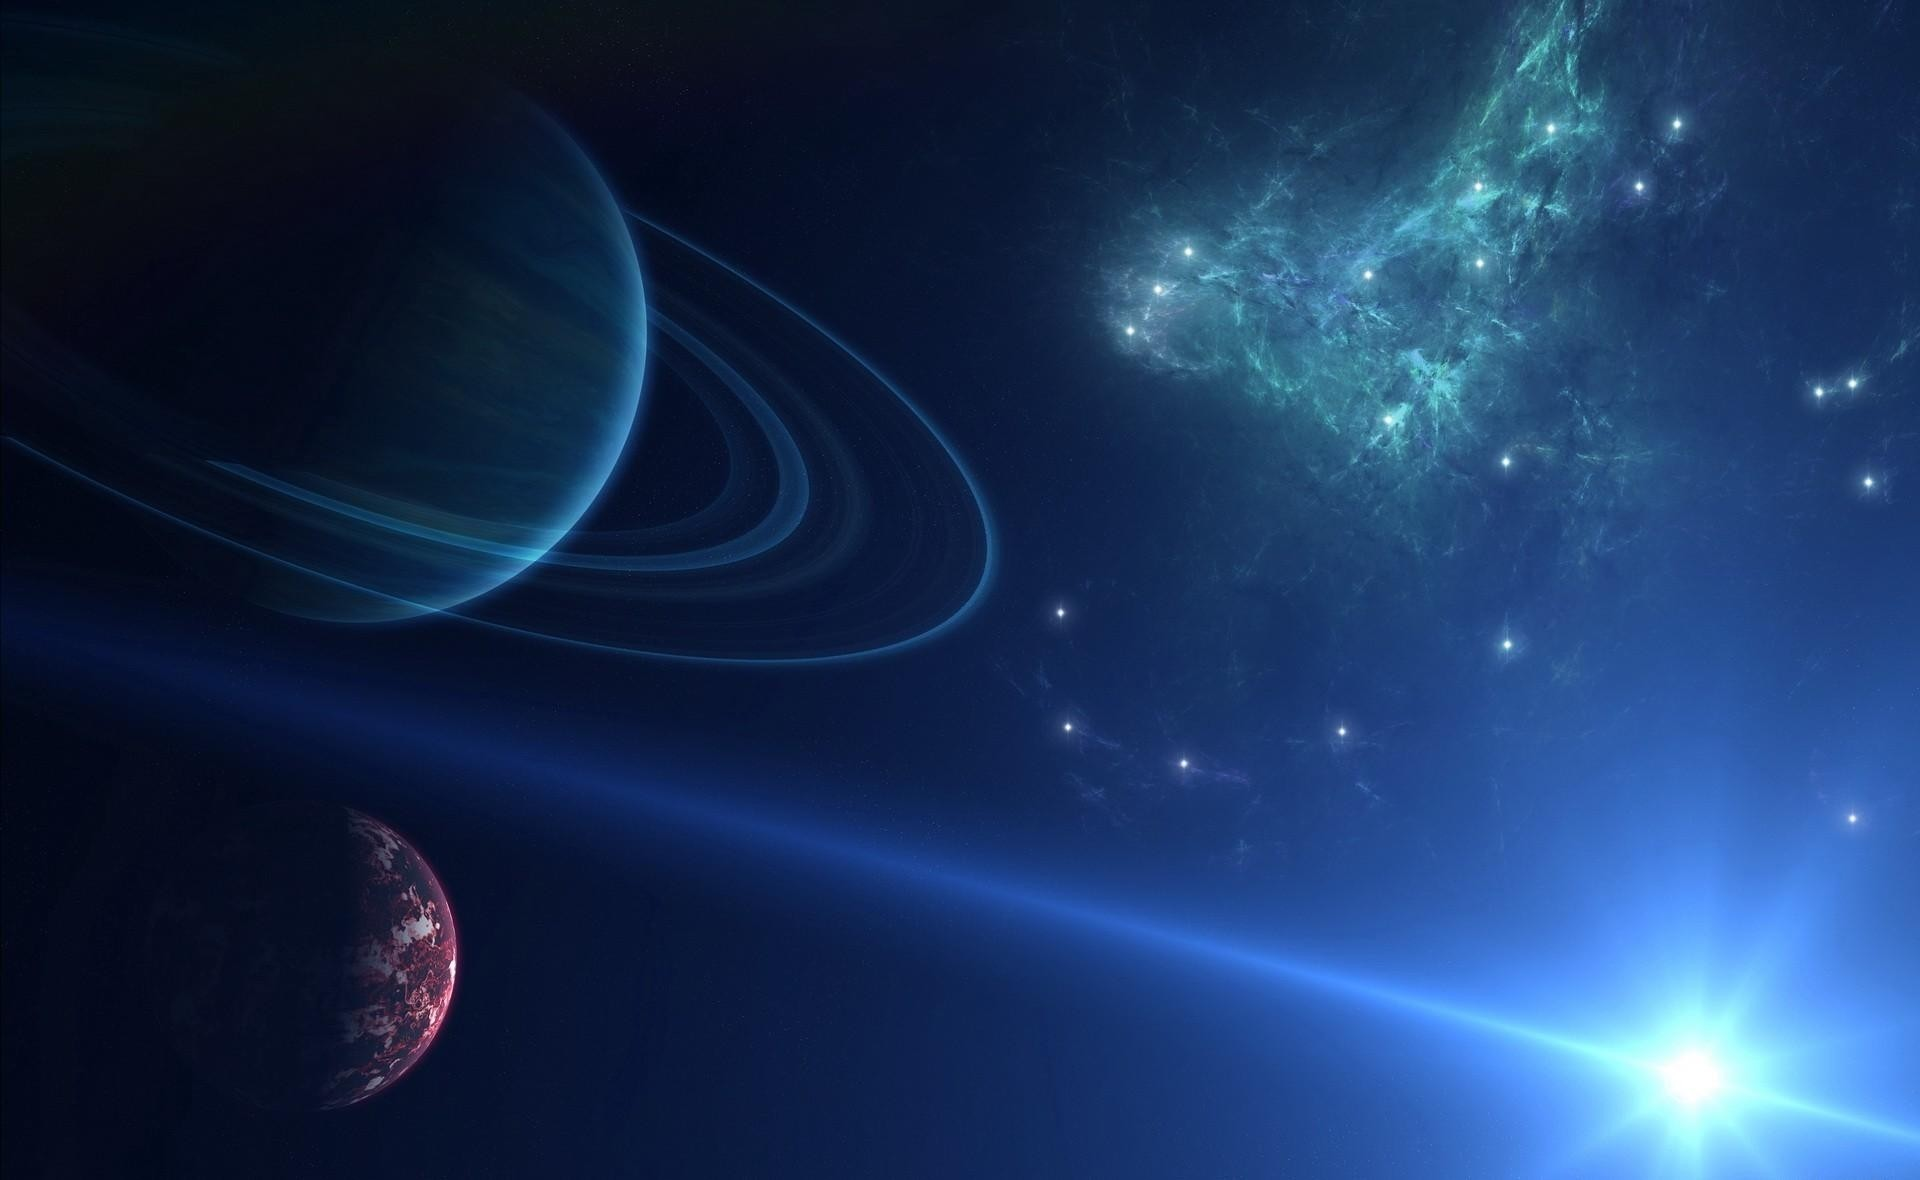 wallpaper splash of nova in deep space.